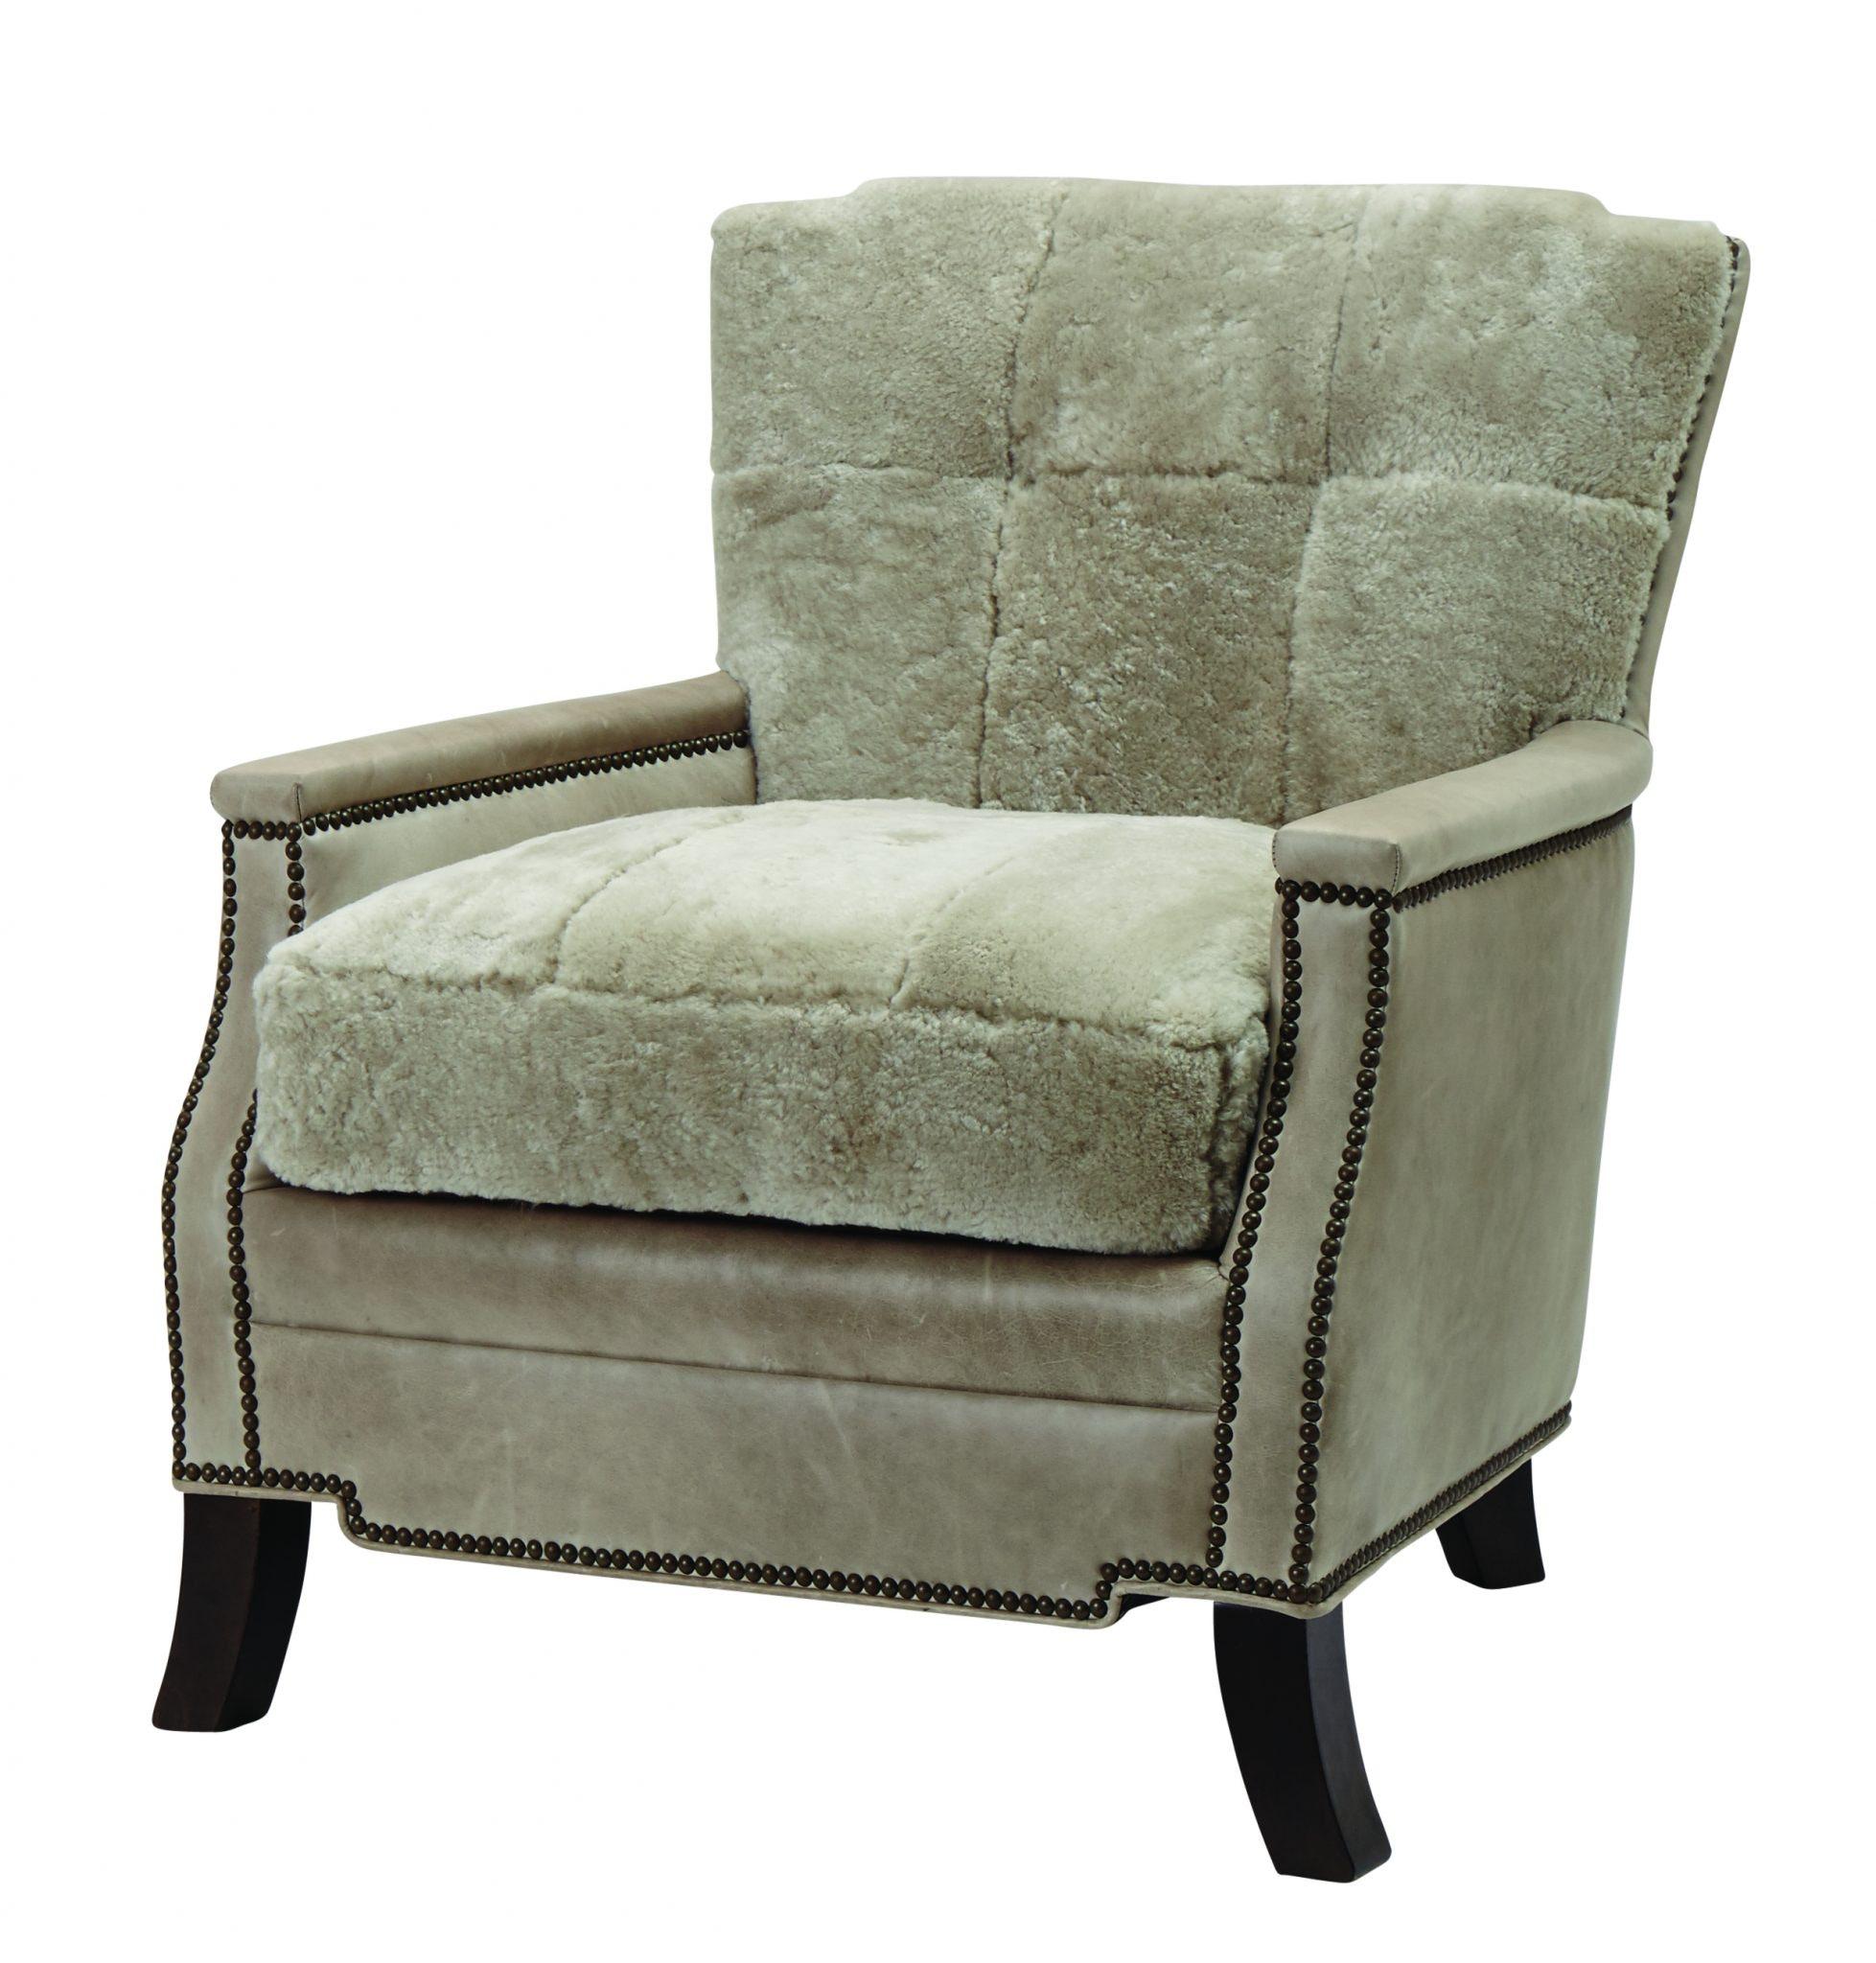 shearling darling chair